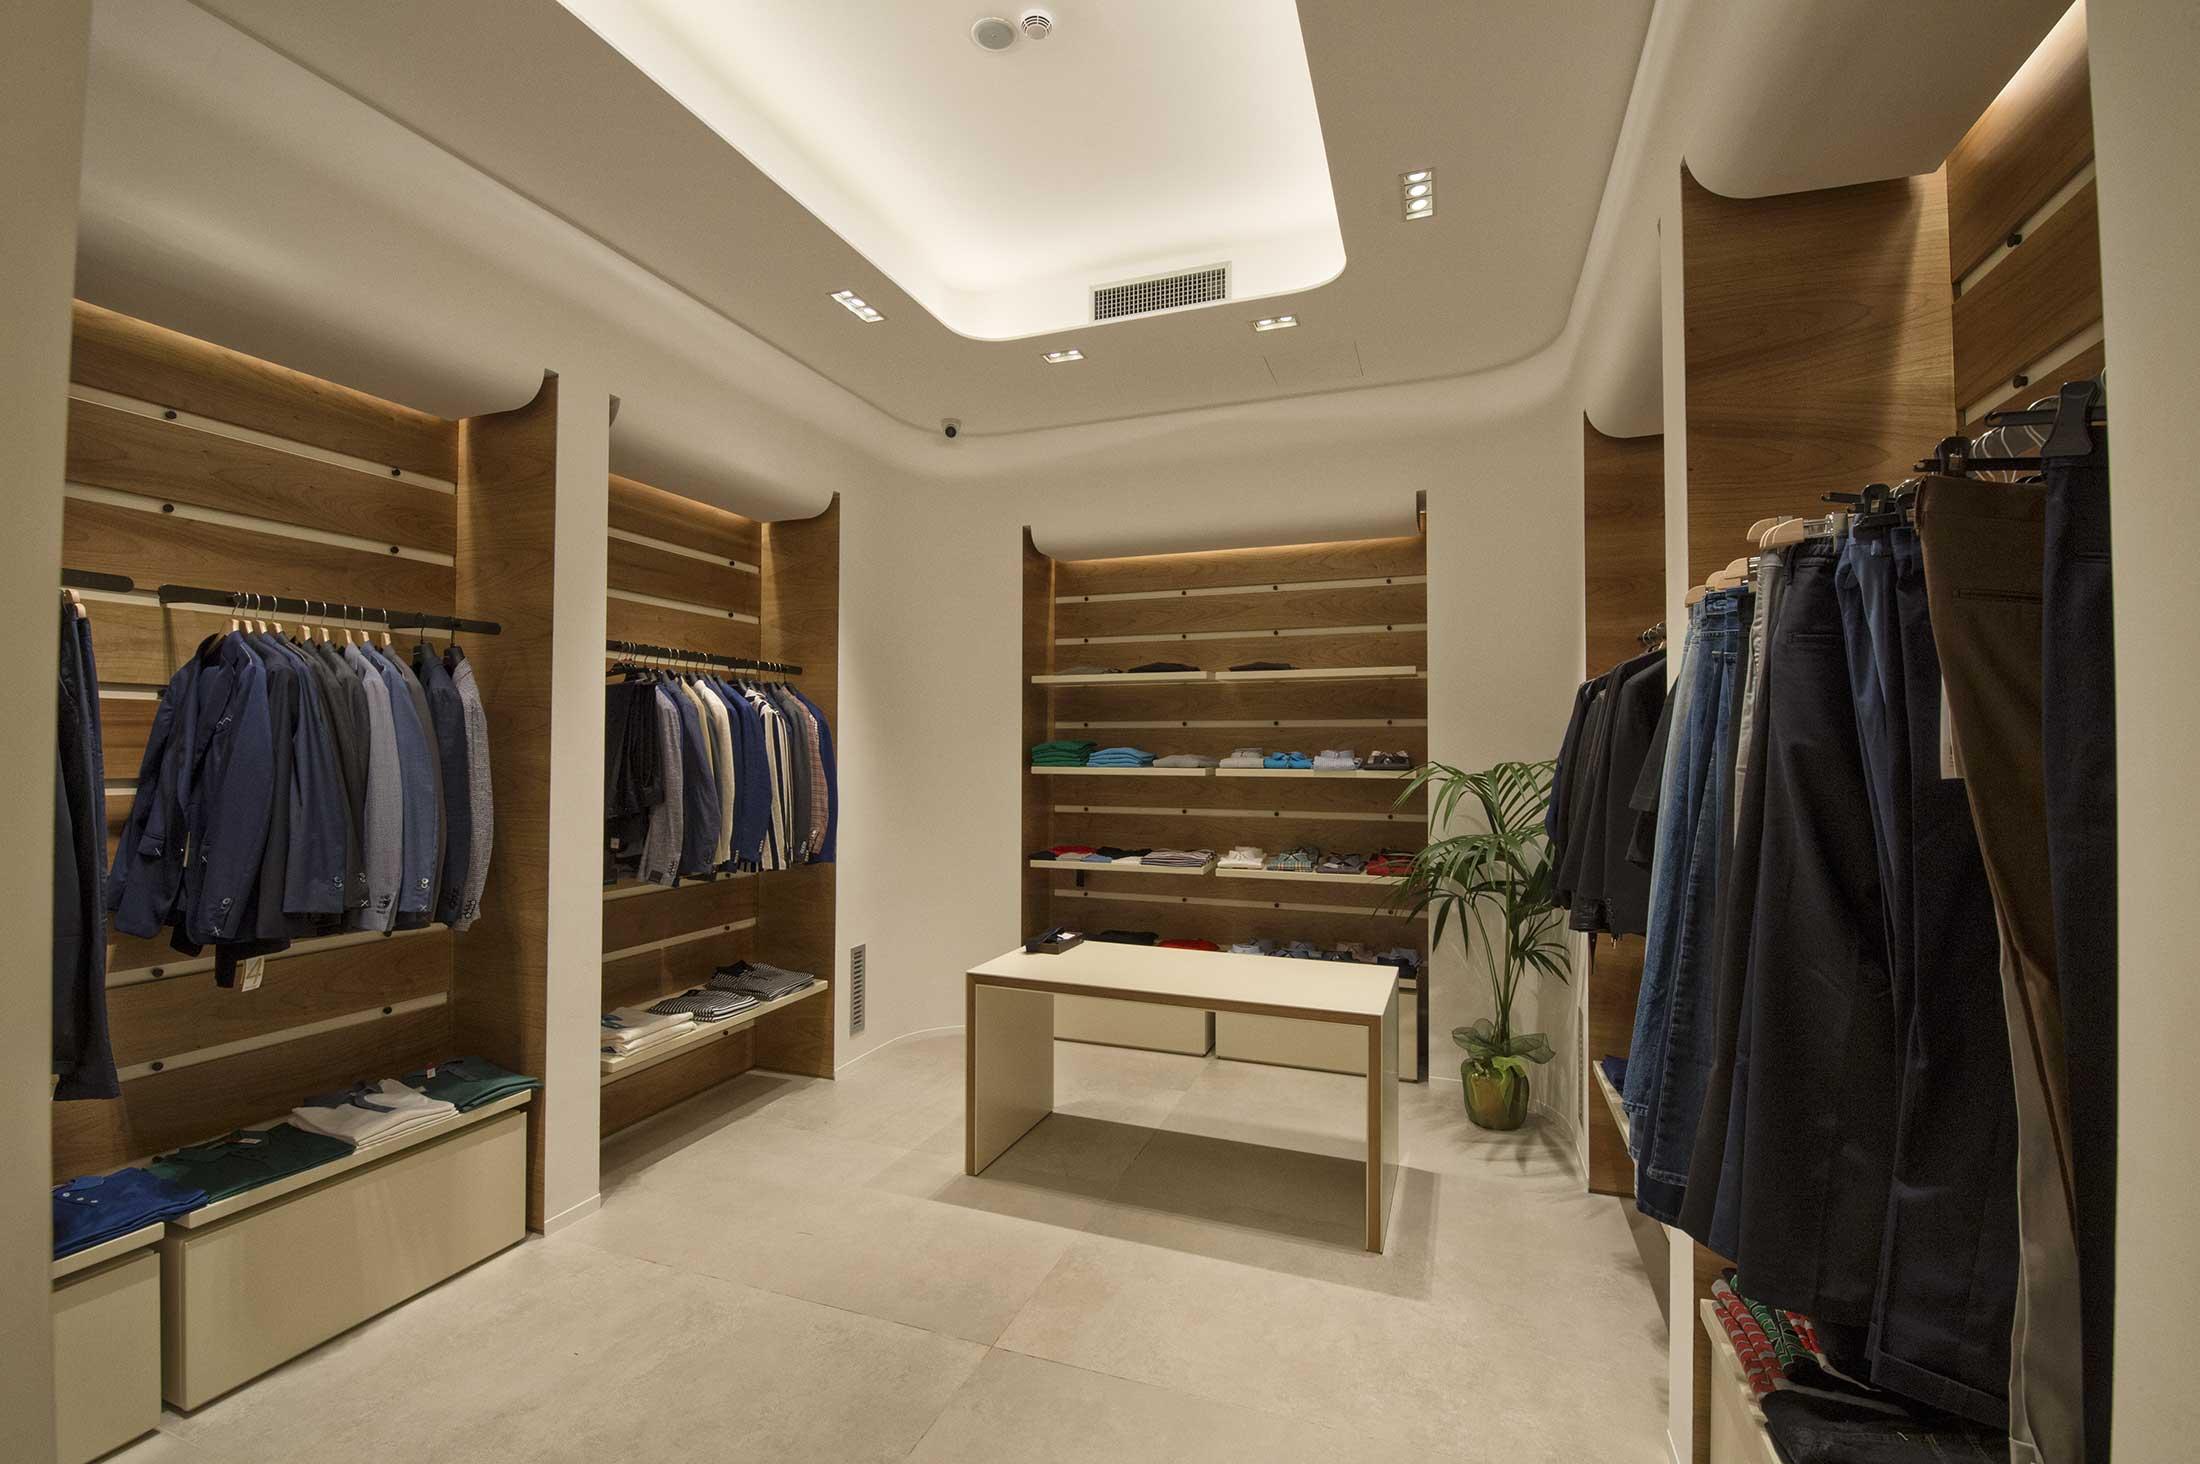 Opposti-Boutique-Addessi-Solutions (6)